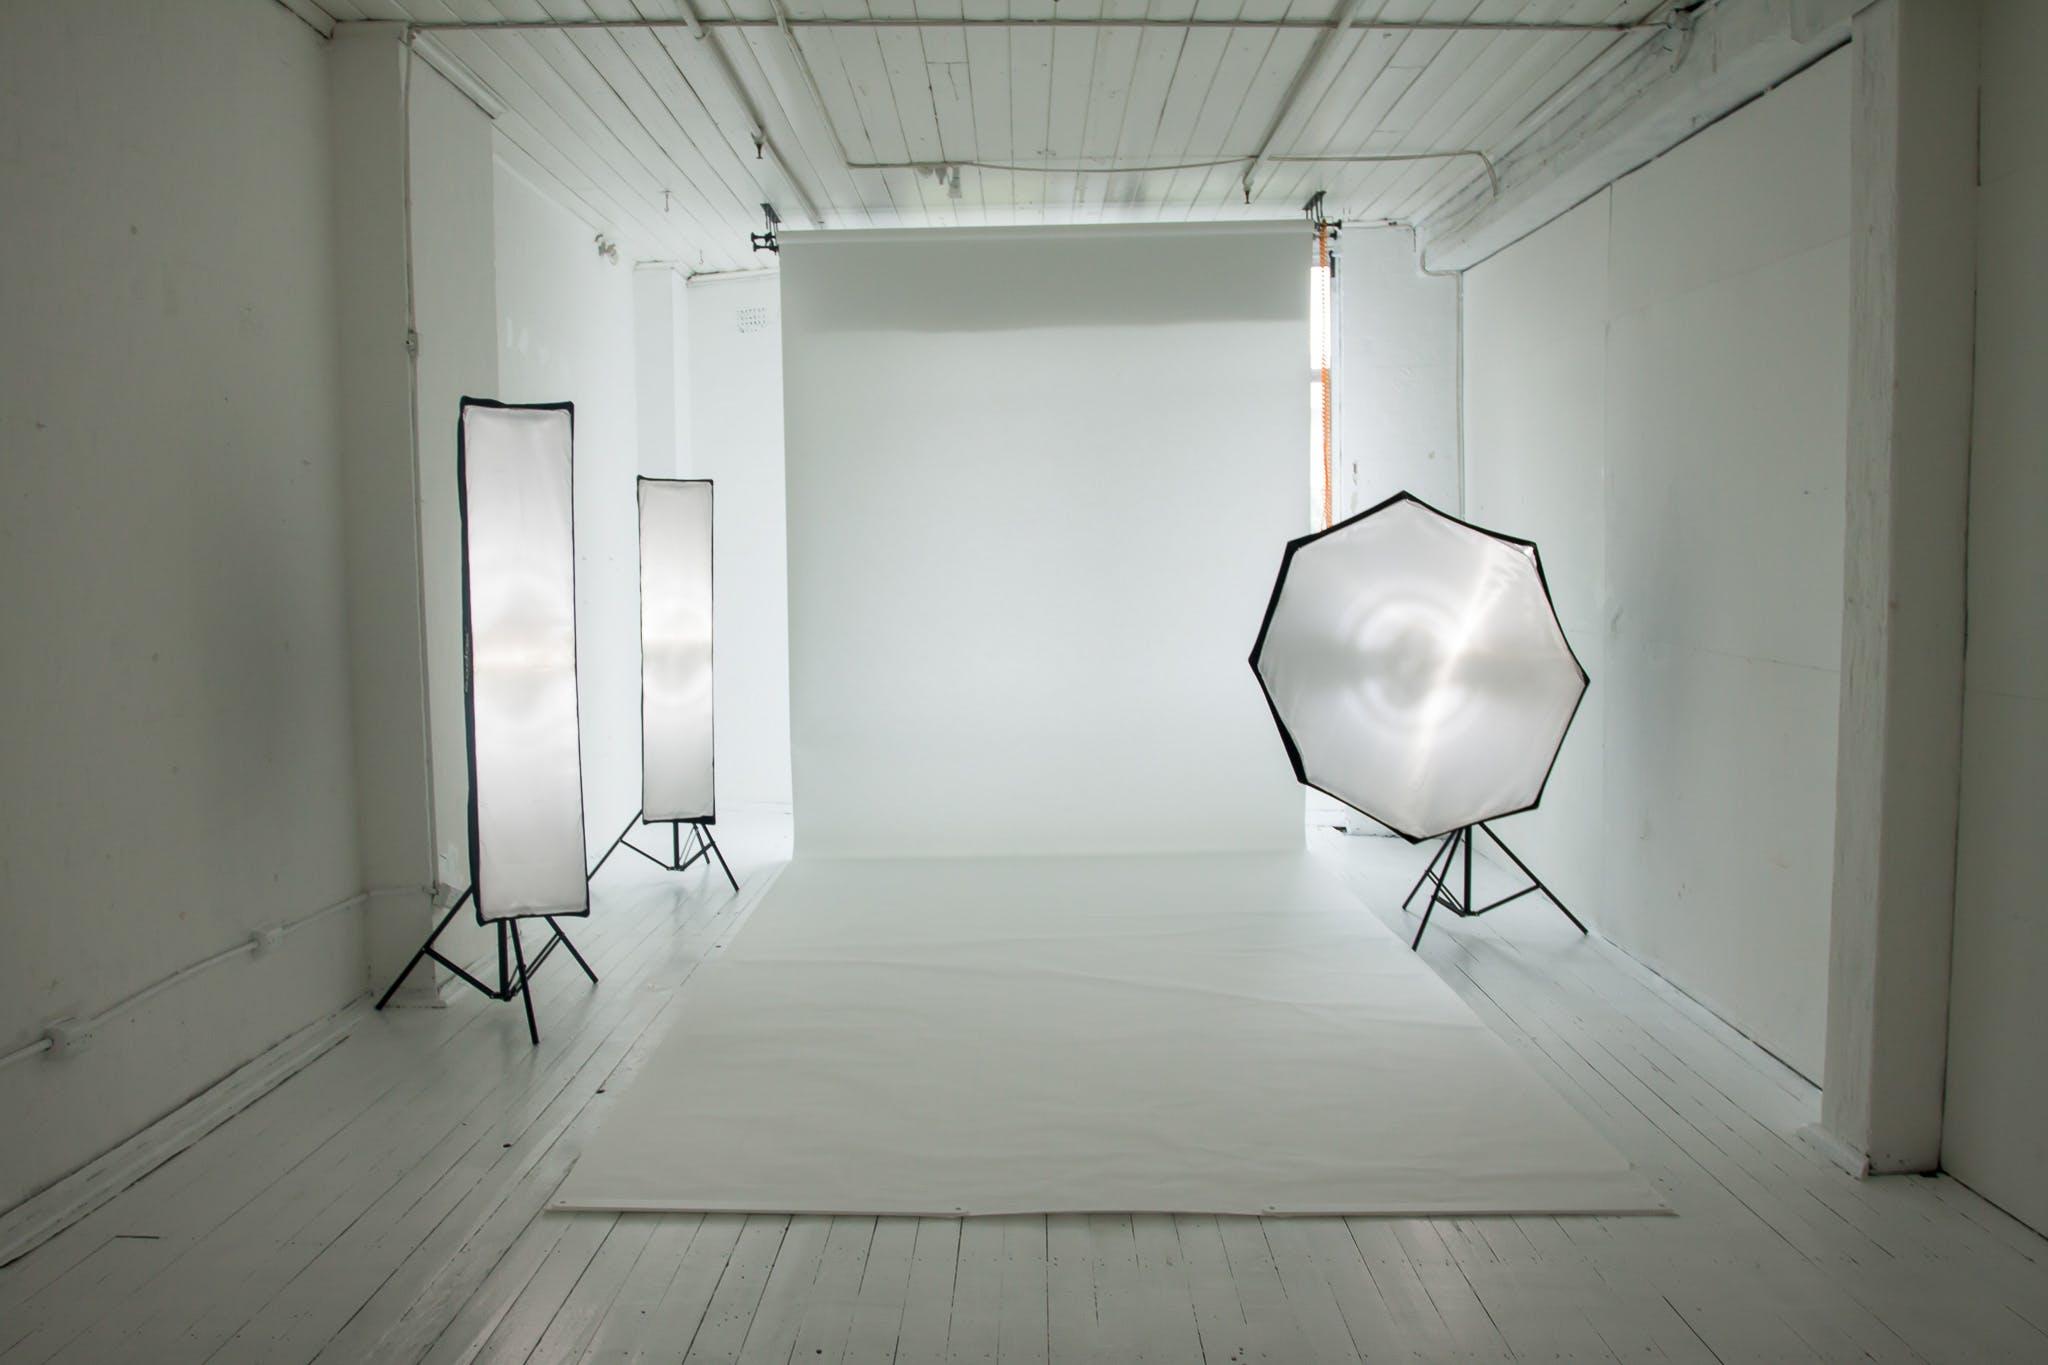 Photography Studio - The White room, creative studio at Studio Blueprint Photography Studio, image 1